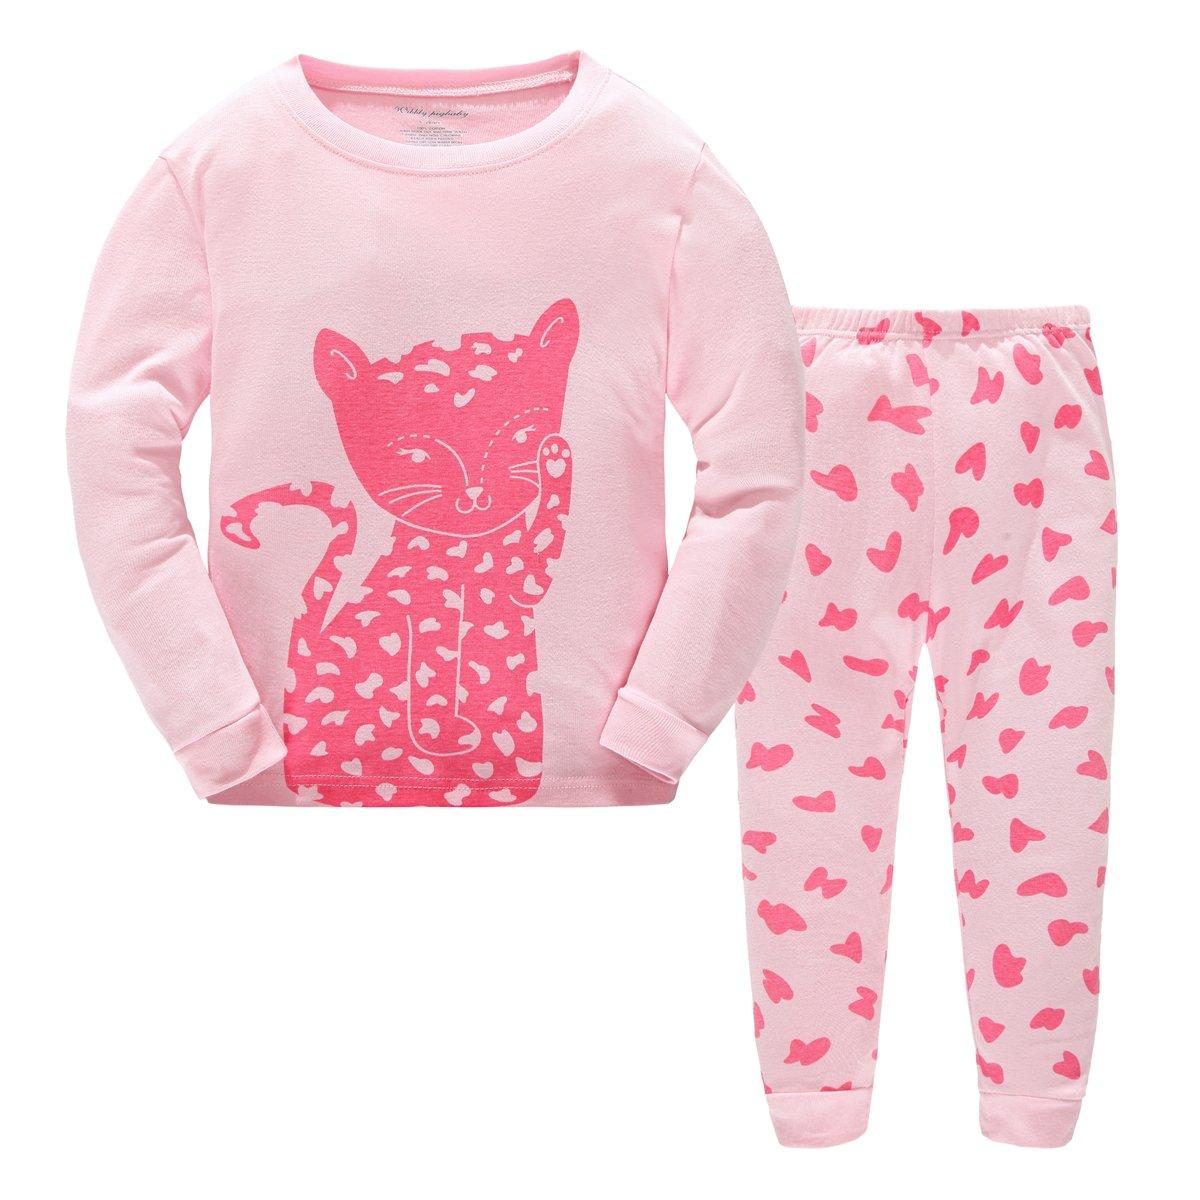 Amazon.com: Girls Pajamas Sets Kids Pjs Cotton Leopard Long Sleeve Sleepwears 2-7 years: Clothing